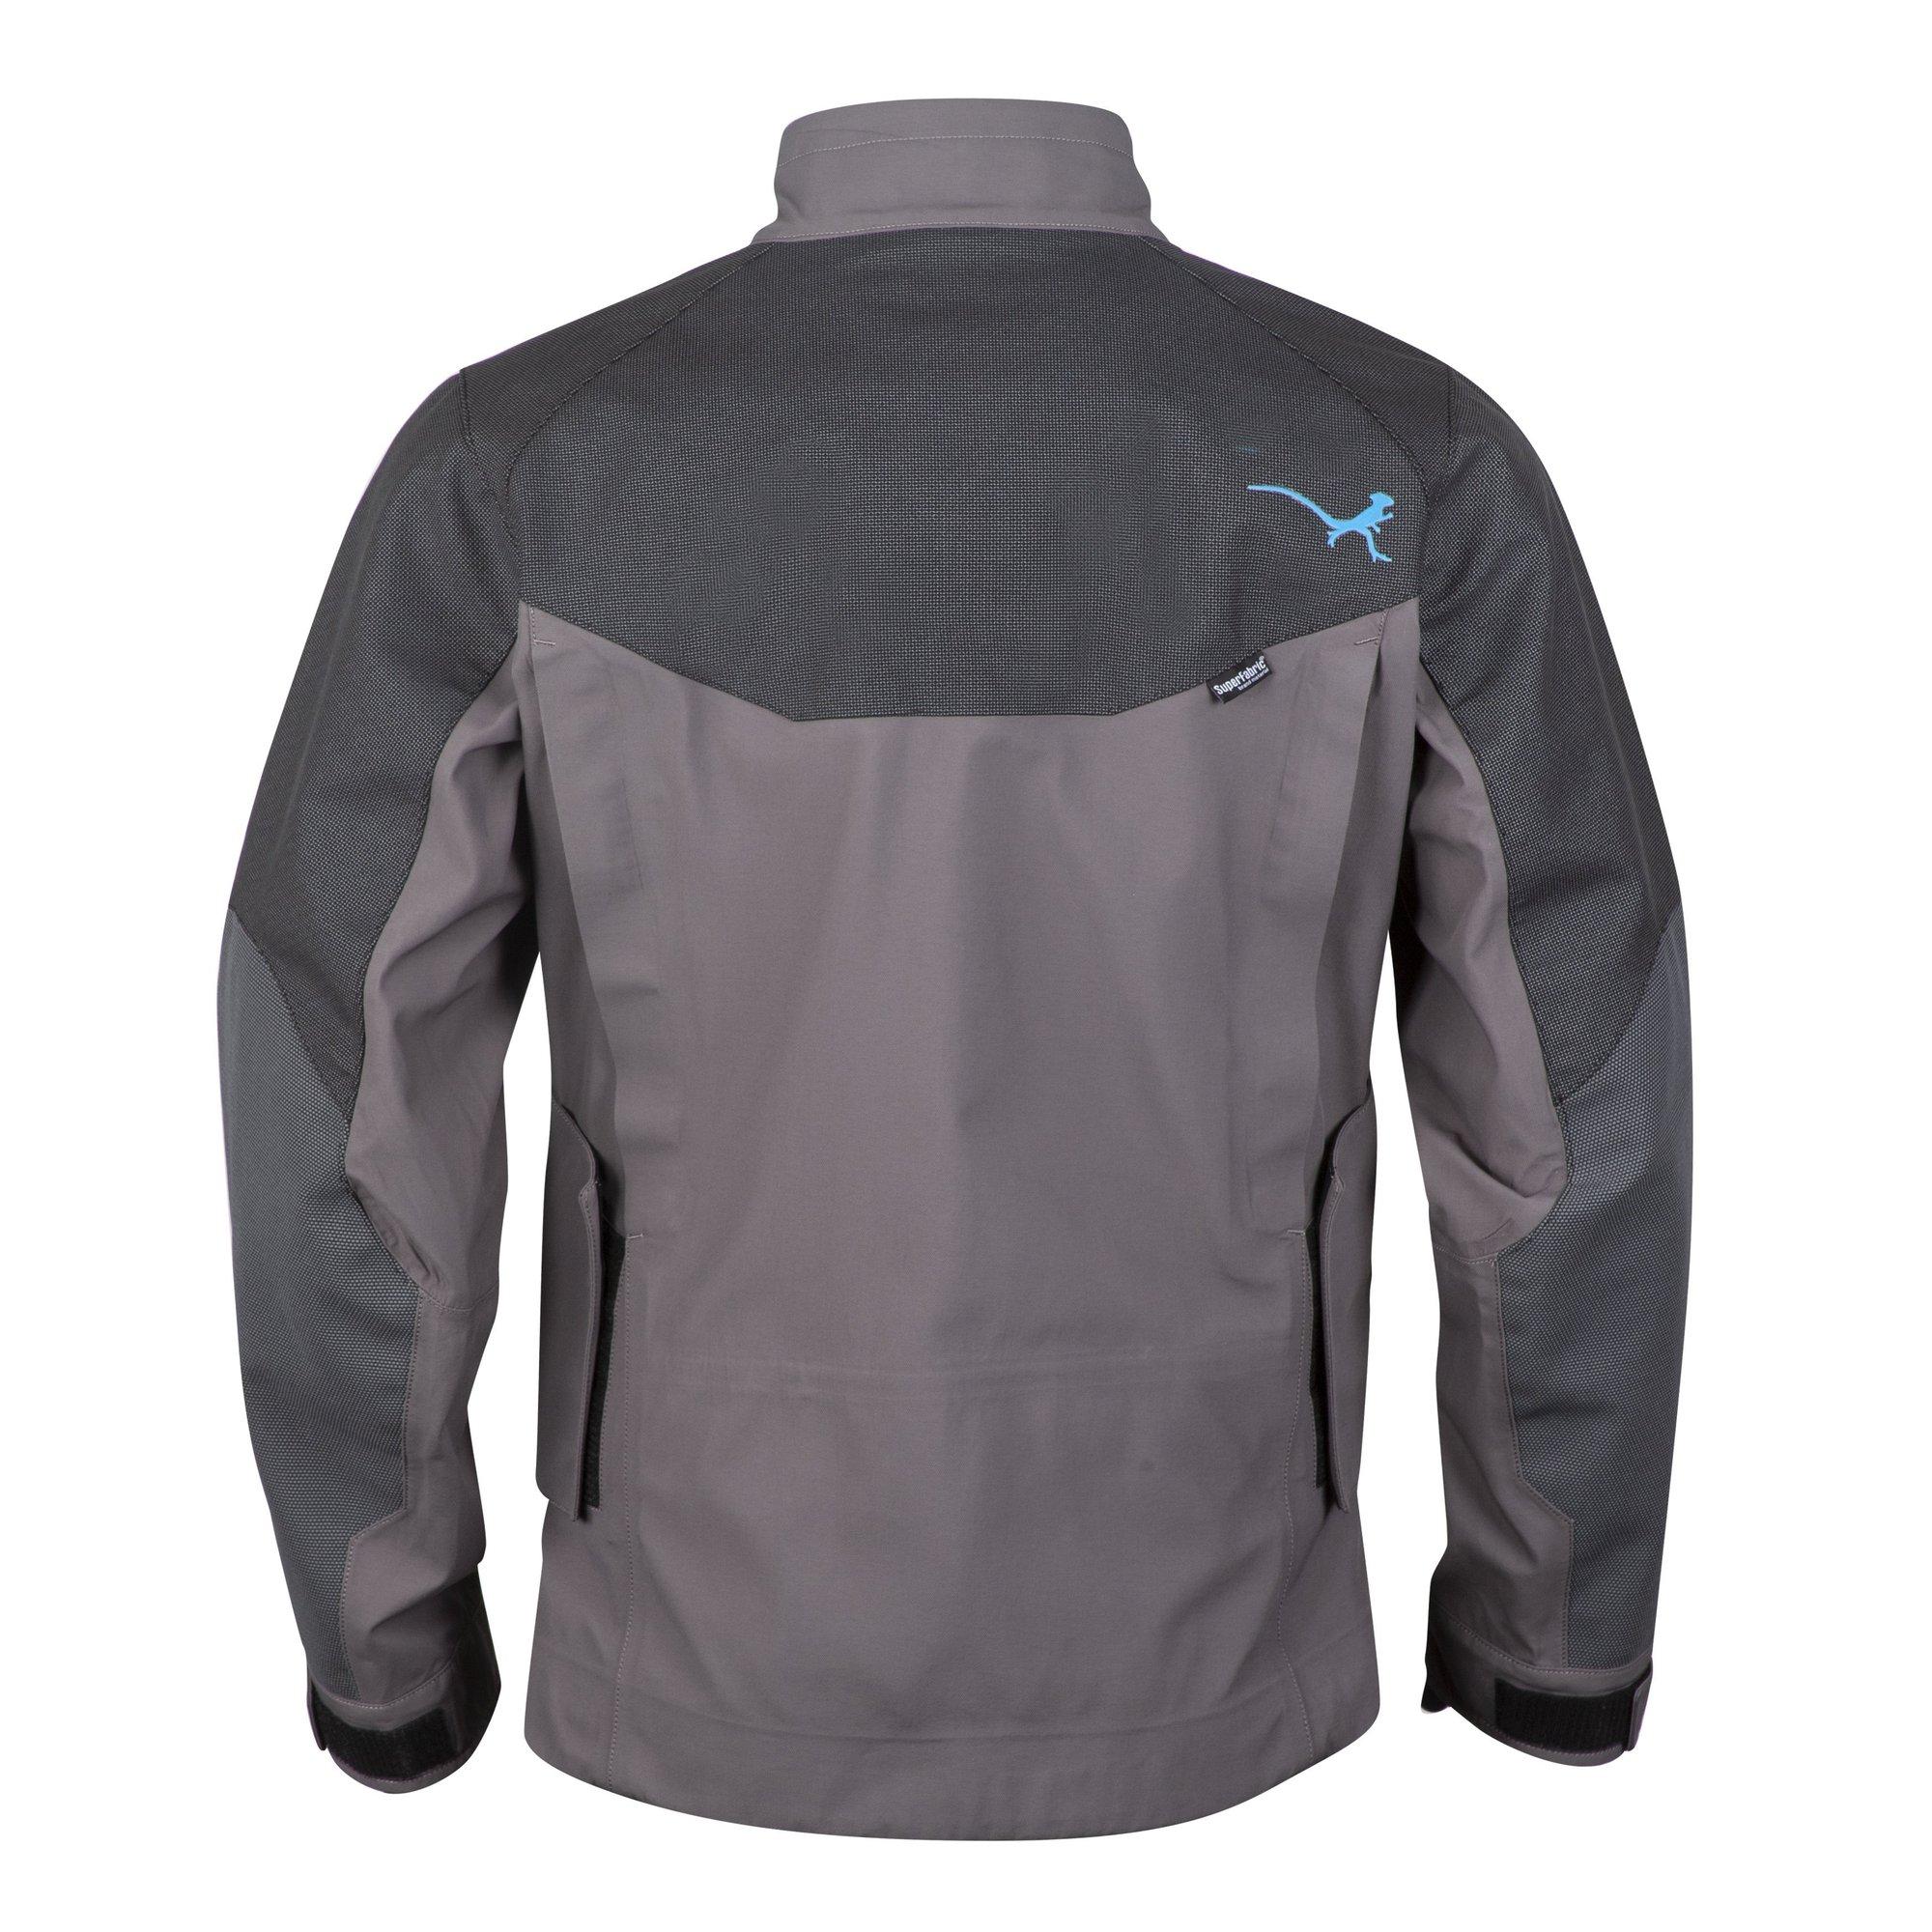 mosko-moto-apparel-s-charcoal-basilisk-jacket-11332269735997_2000x.jpg